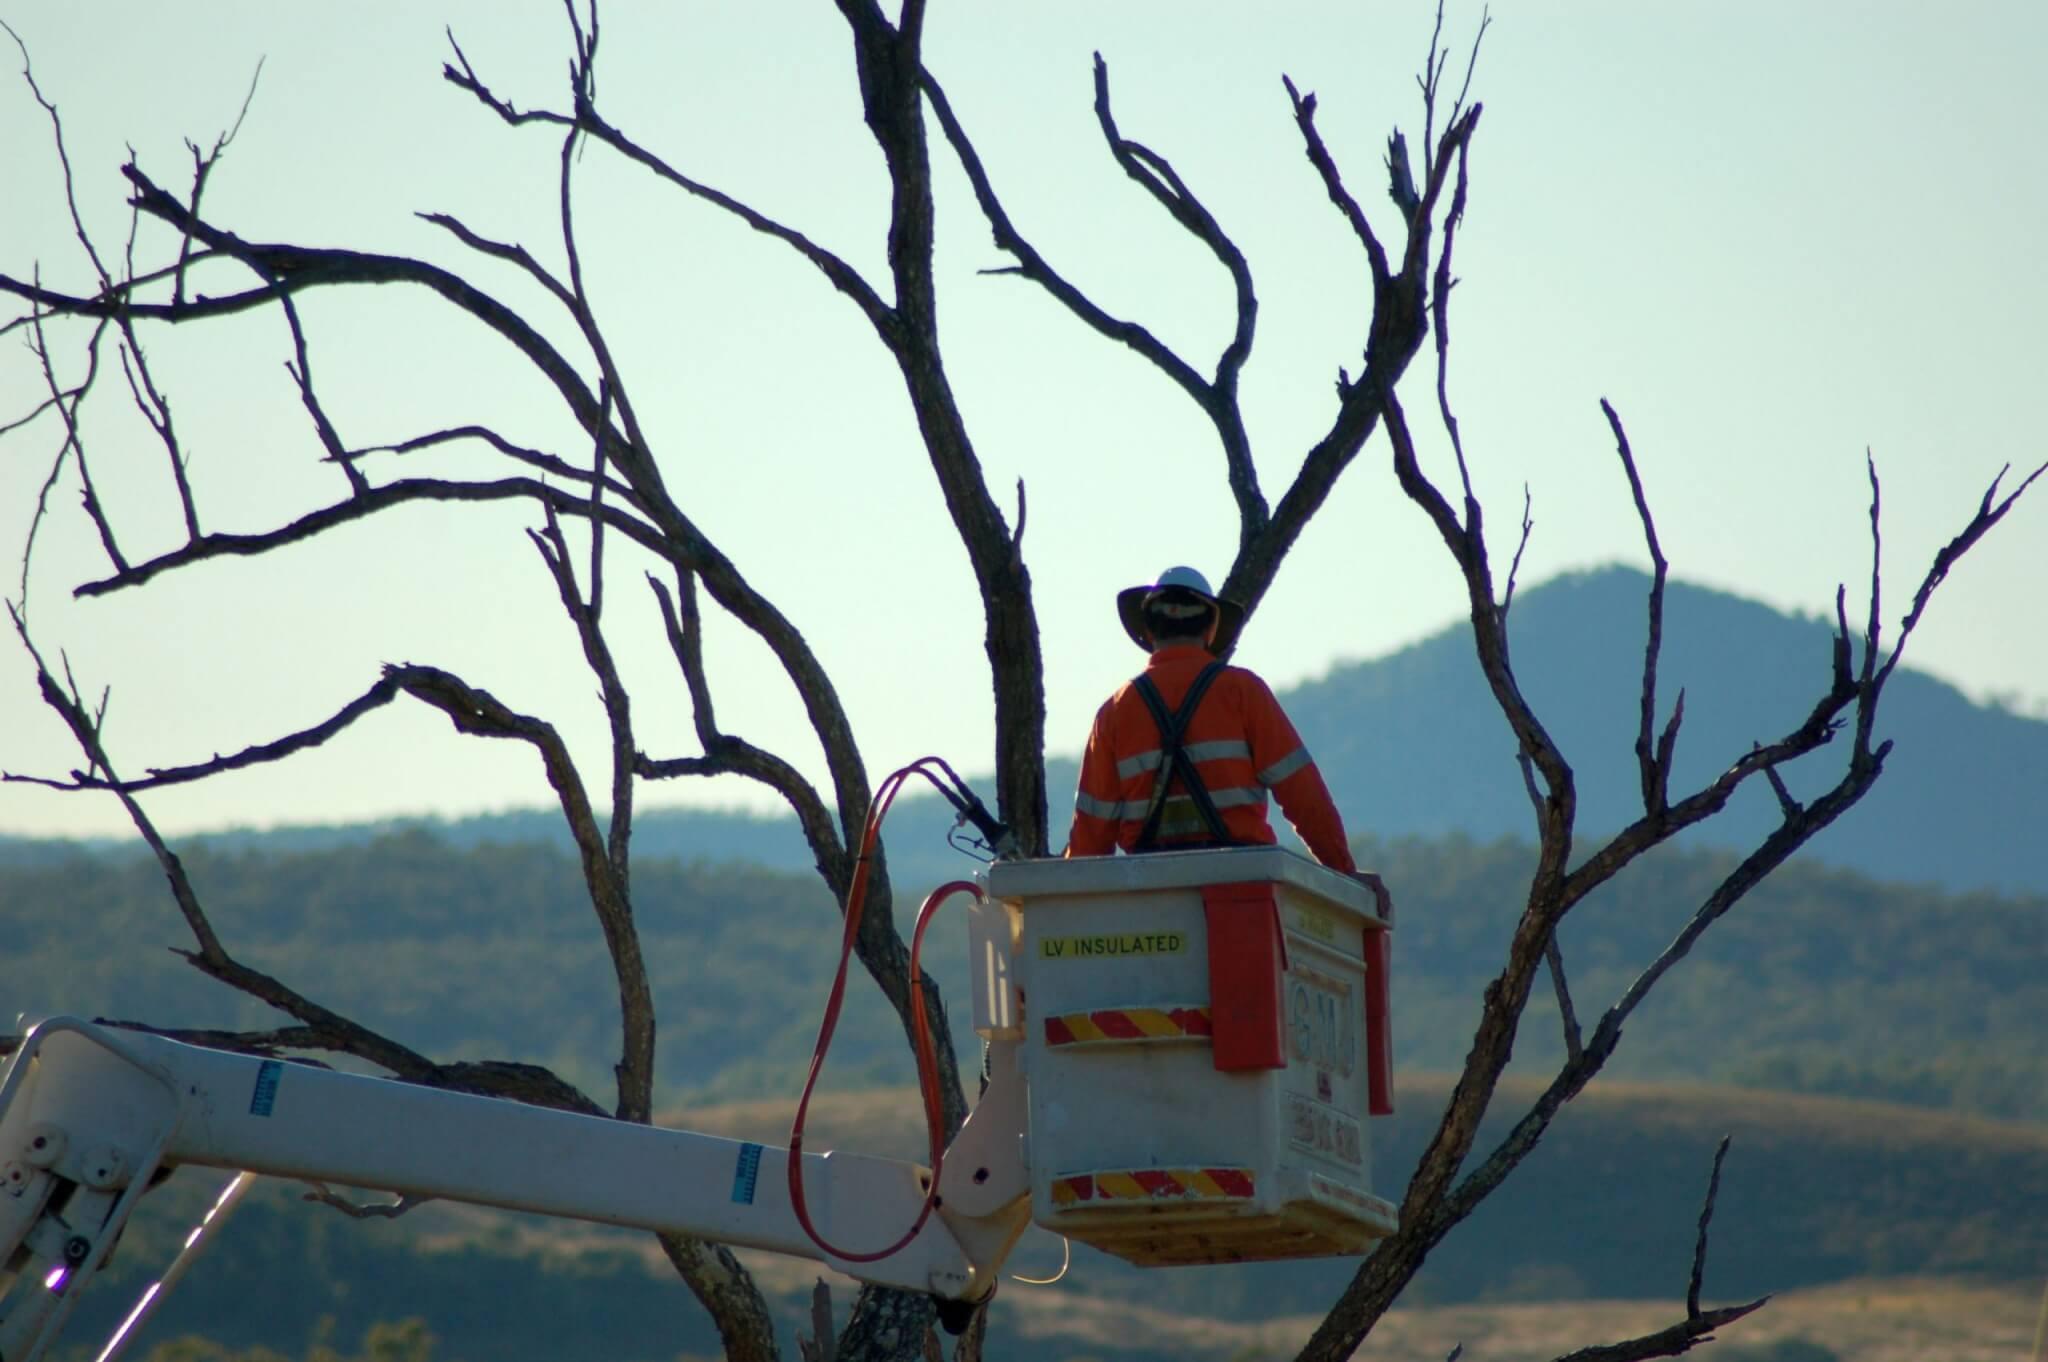 tree services goldcoast image 11